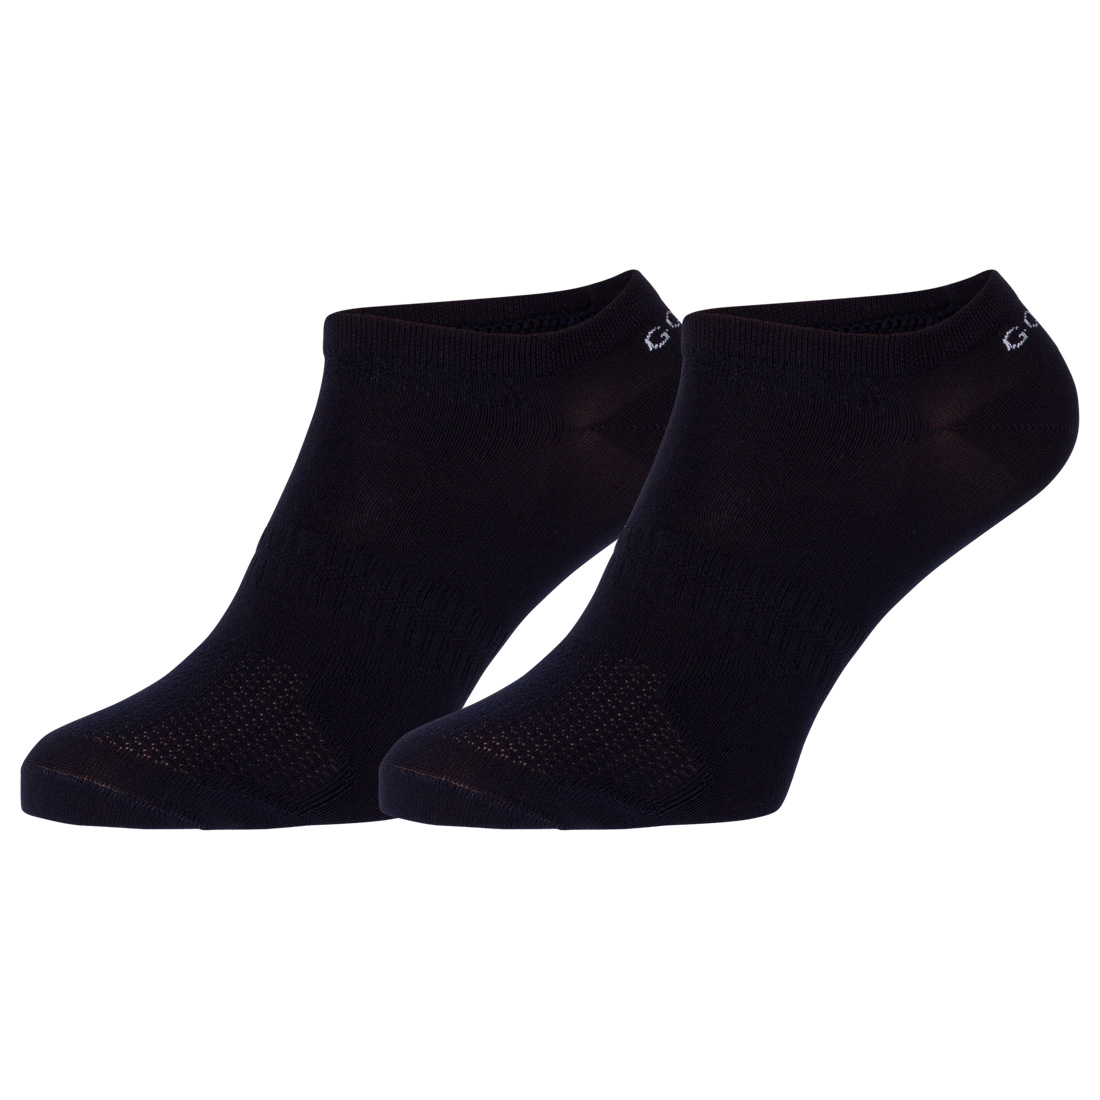 Herren Socken aus feuchtigkeitsregulierendem Material